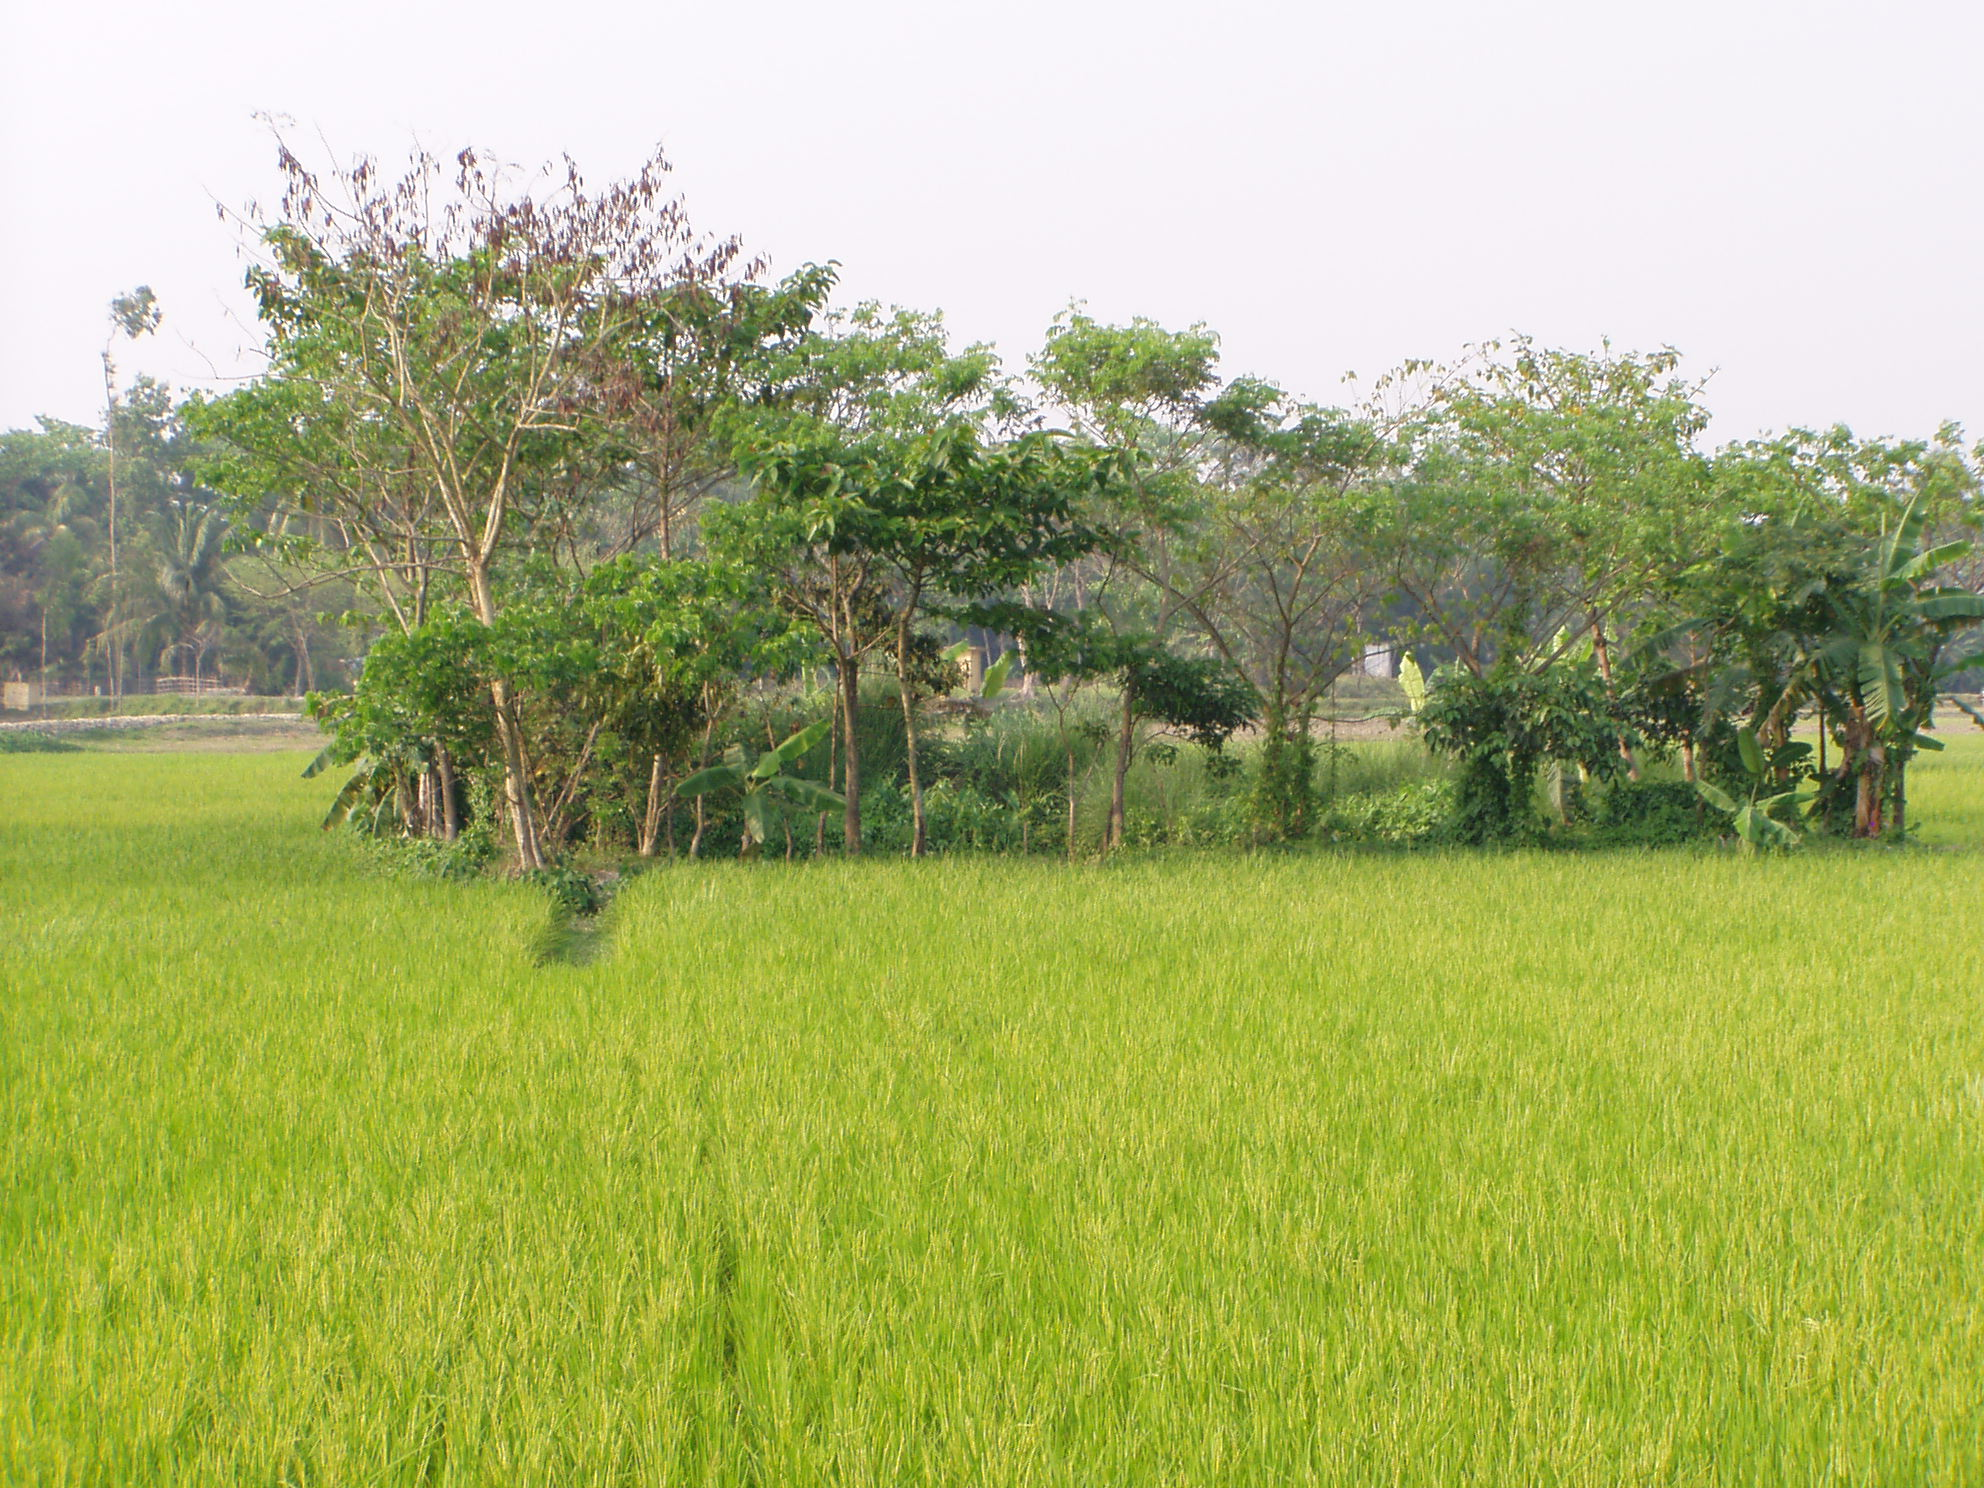 Bangladesh : Green paddy field